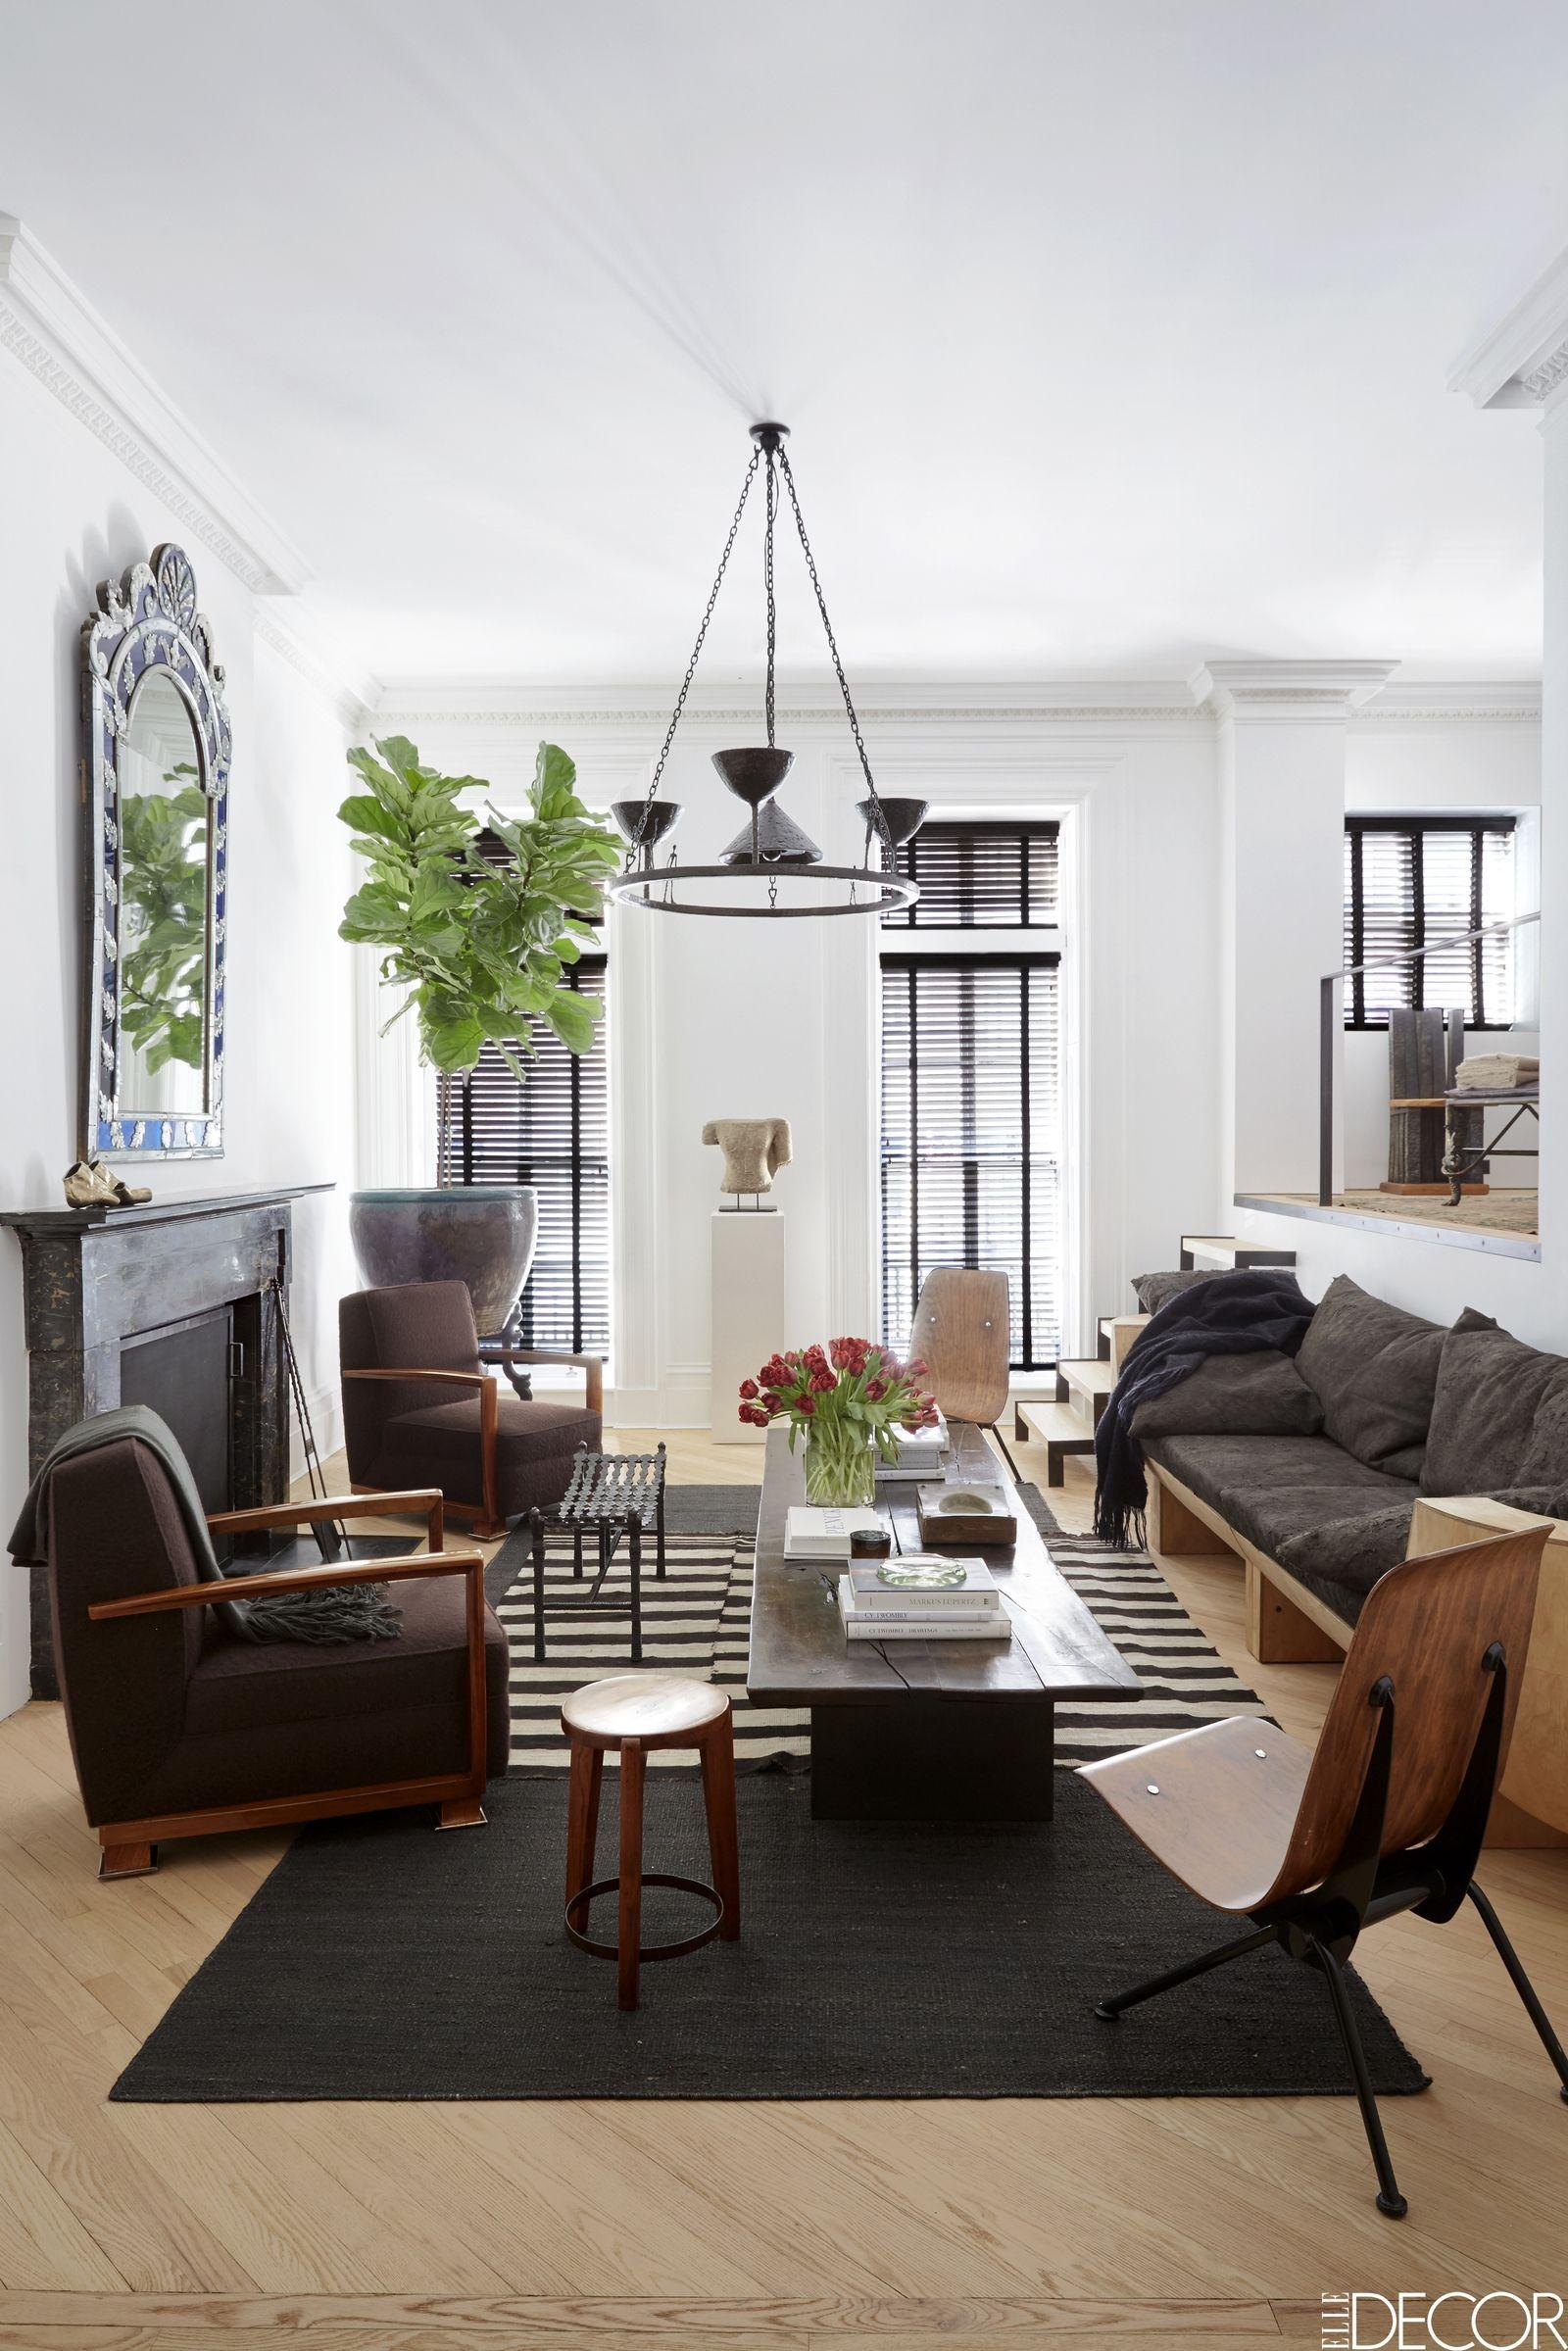 HOUSE TOUR: A New York City Apartment With Laid-Back LA Vibes | City ...